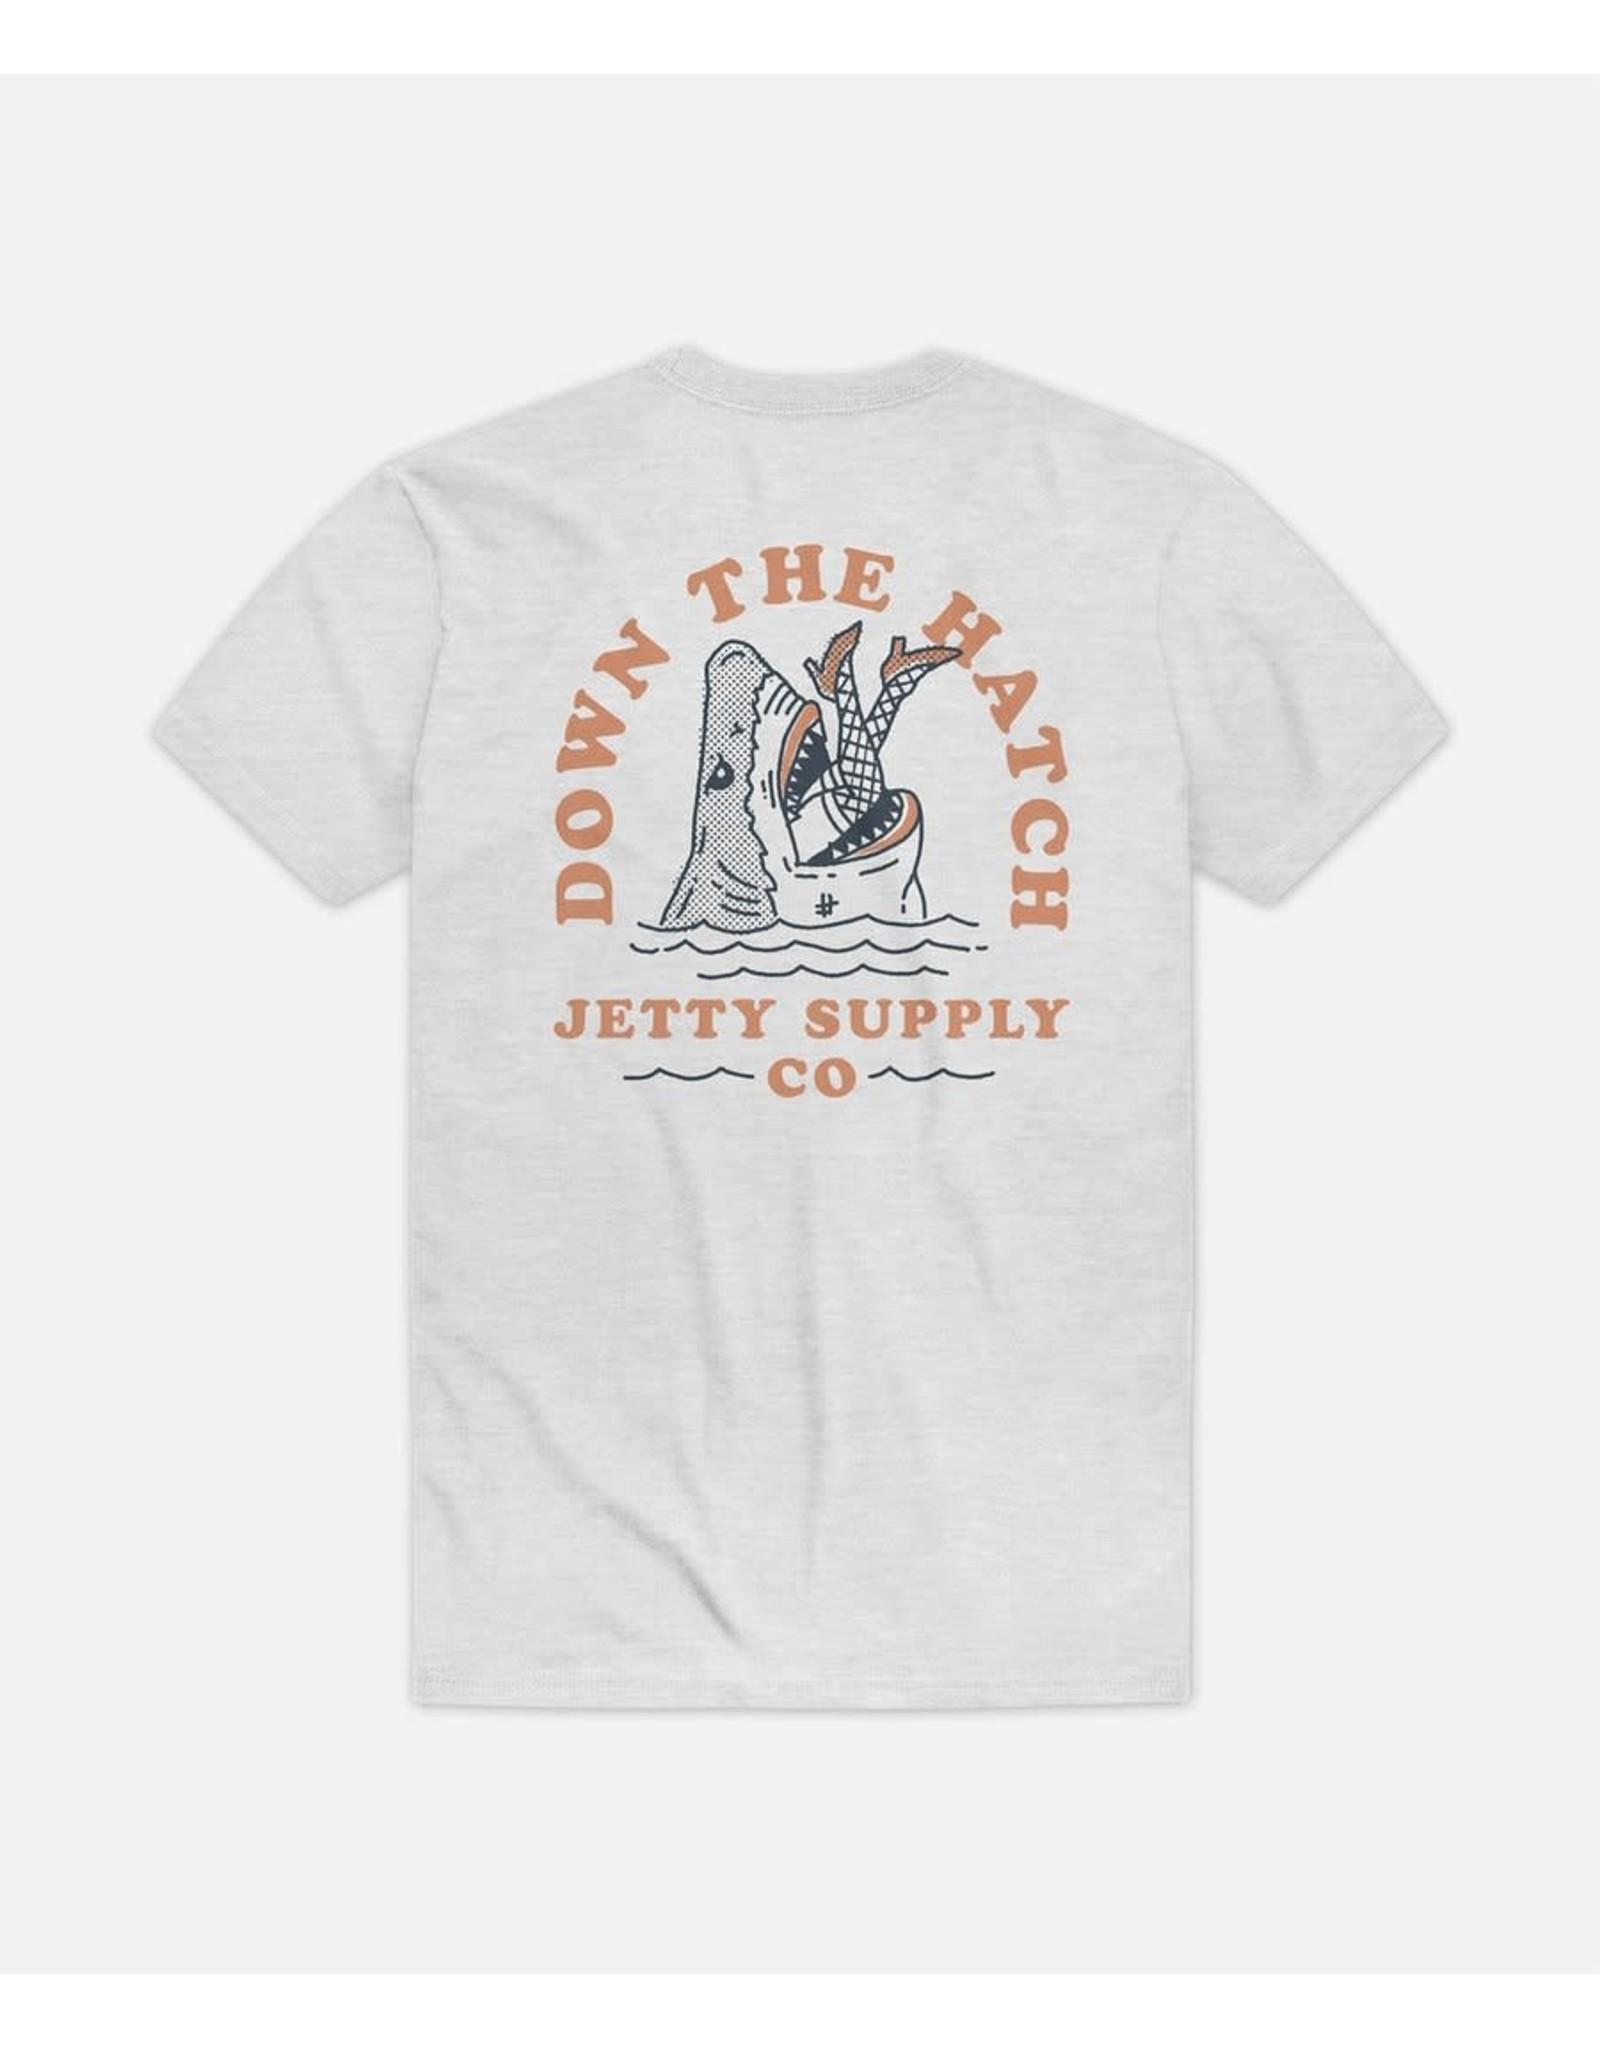 Jetty Hatch Tee